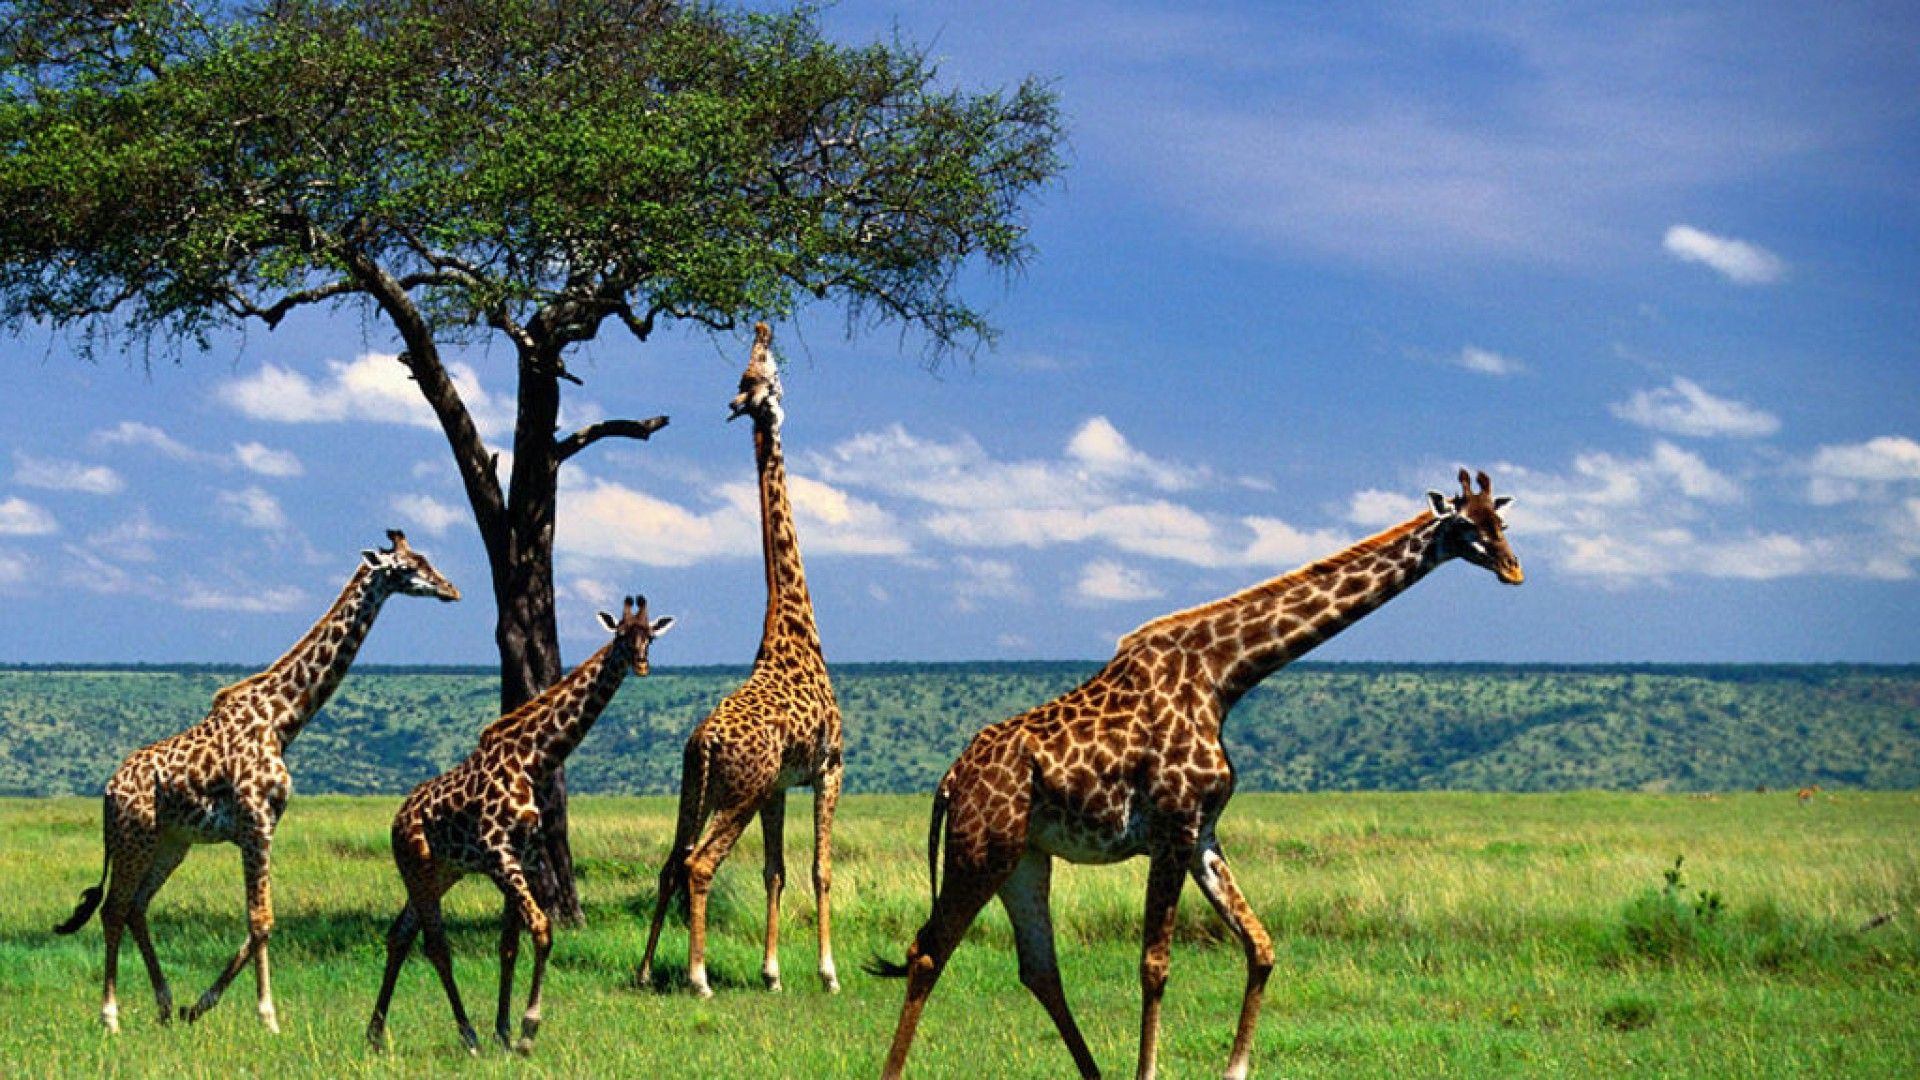 Serengeti National Park Giraffe